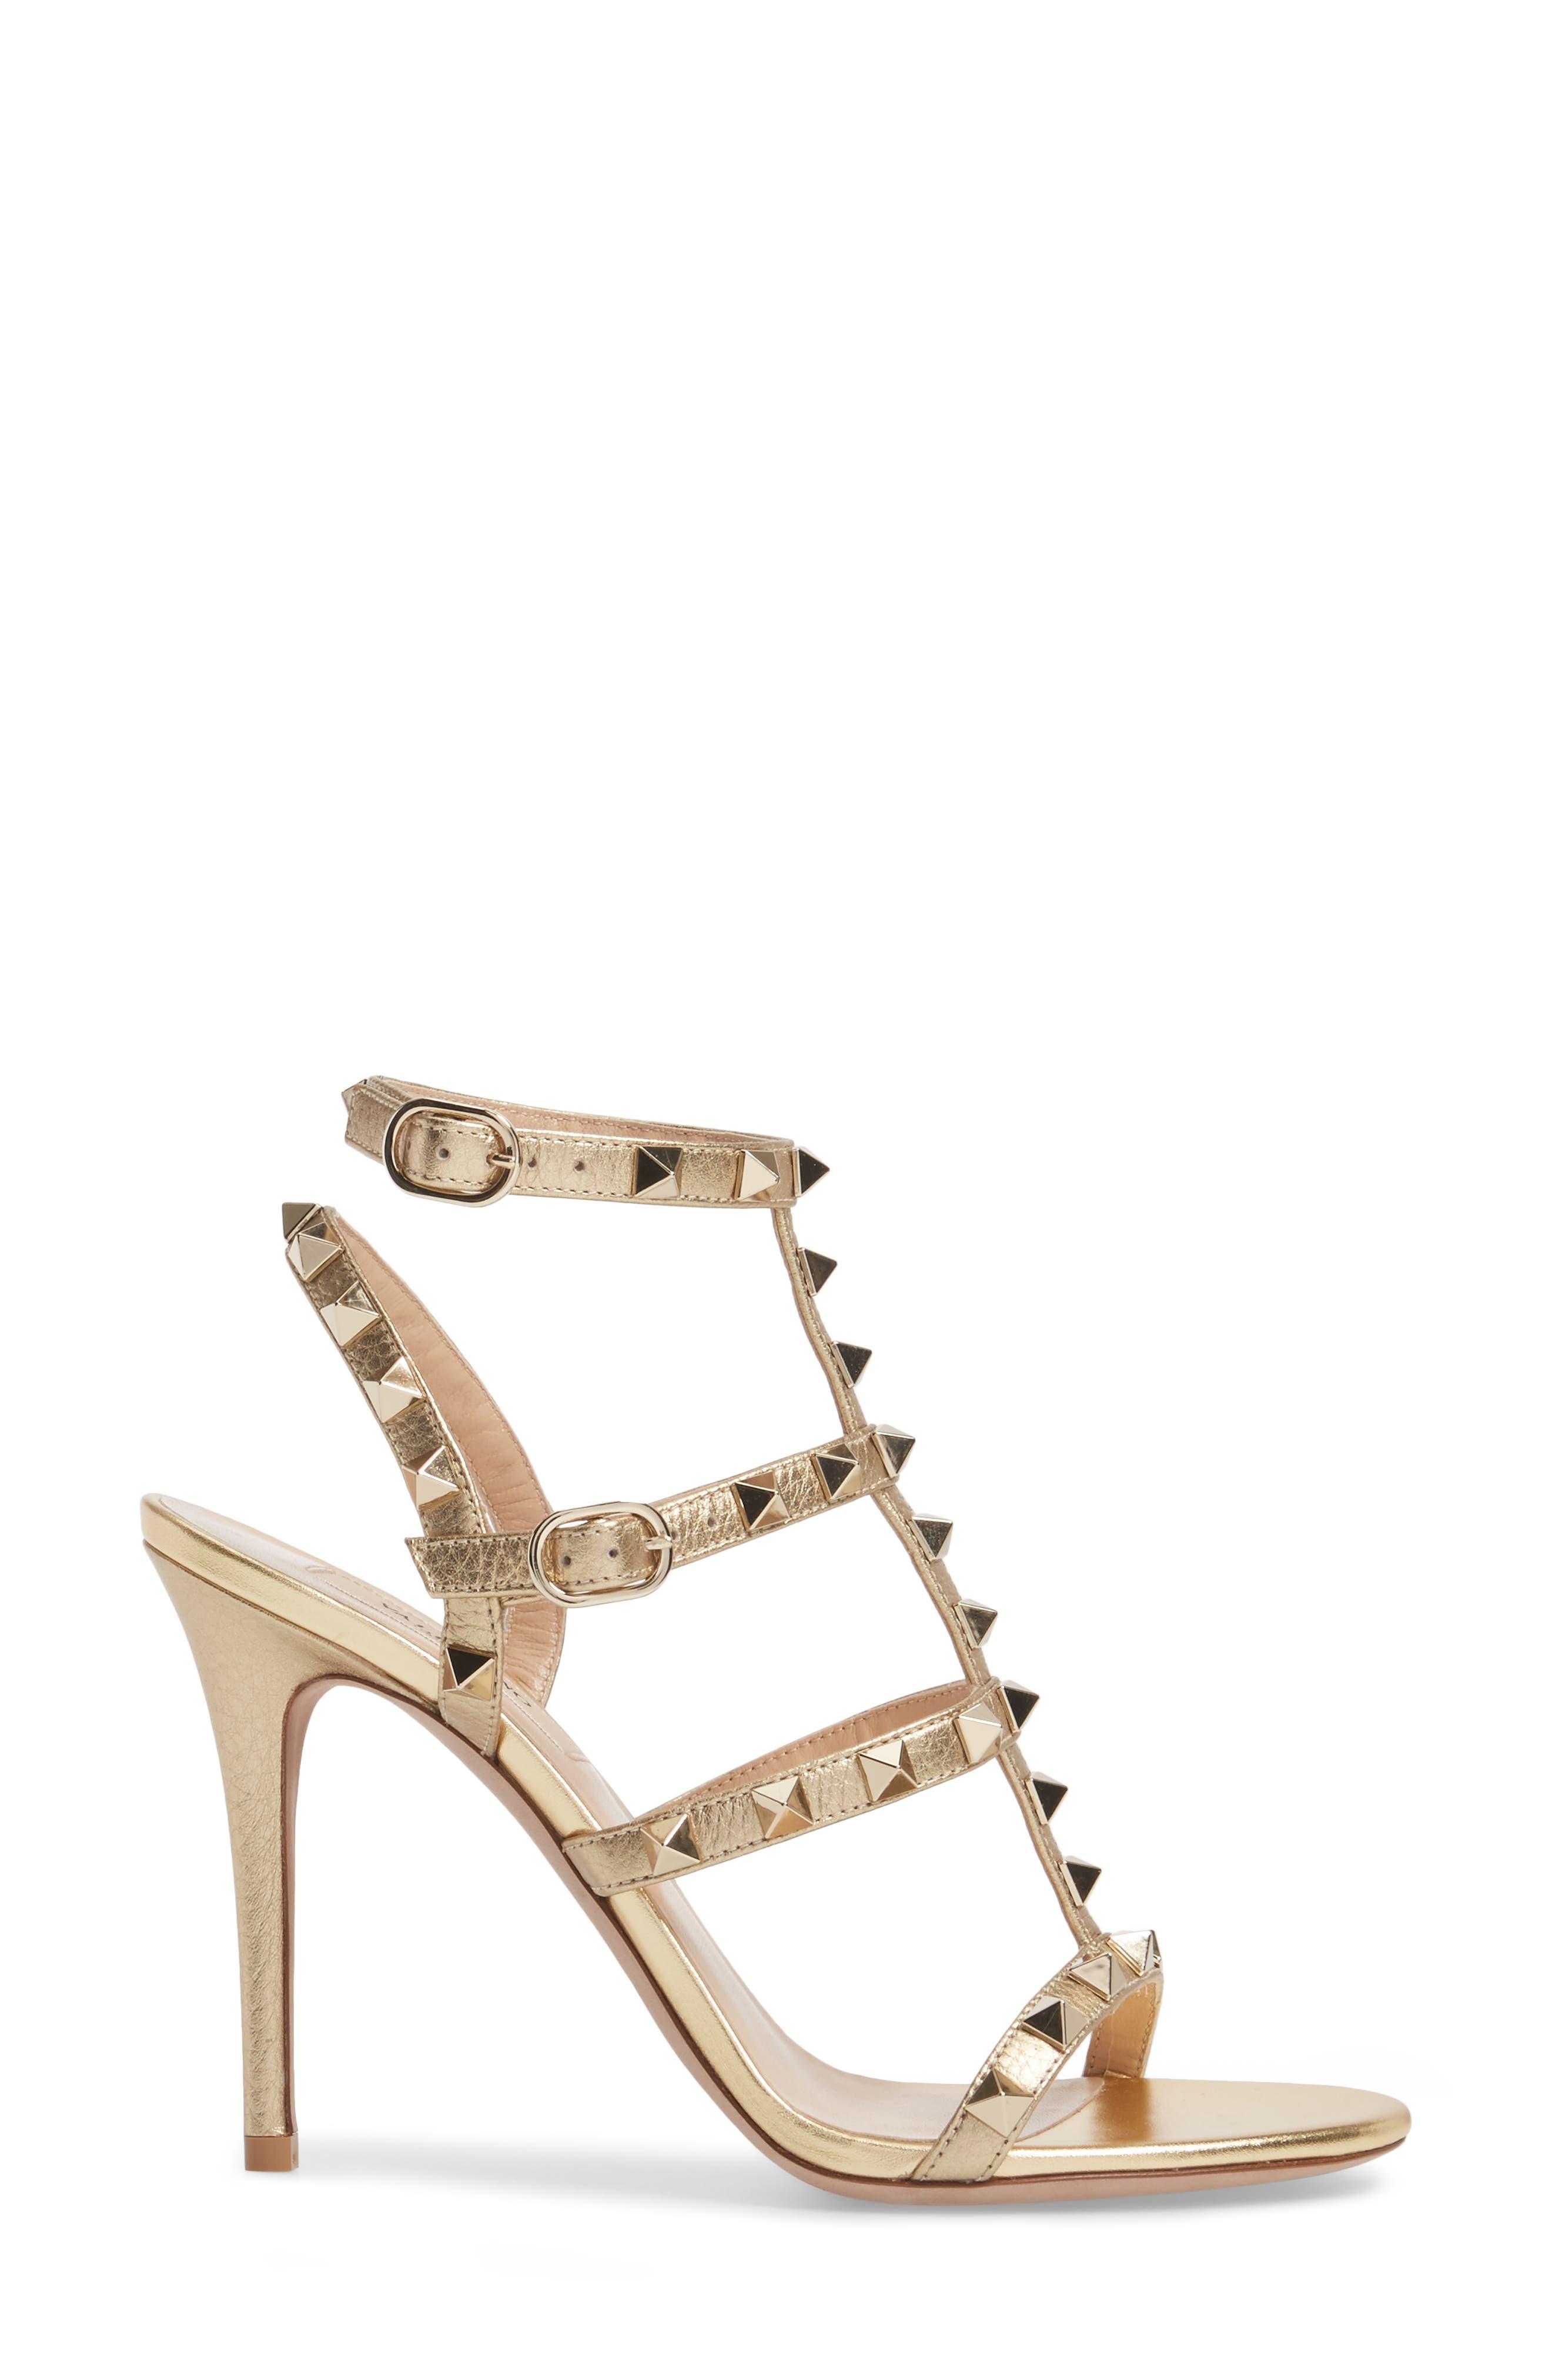 VALENTINO GARAVANI, Rockstud Metallic Ankle Strap Sandal, Alternate thumbnail 3, color, 710